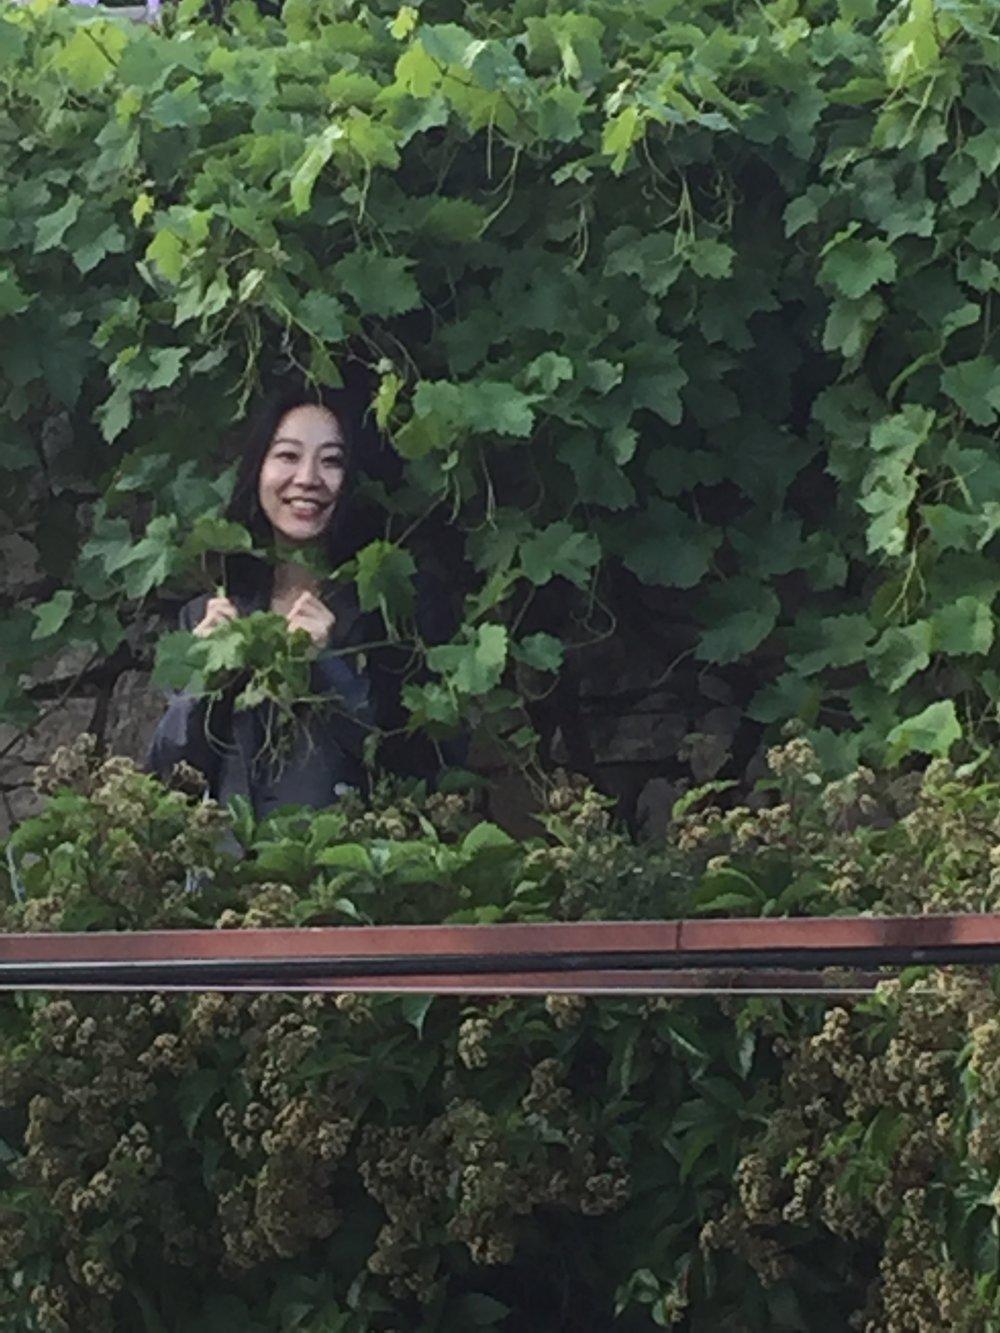 Diane Green_Minciotti Garden June 2018.JPG